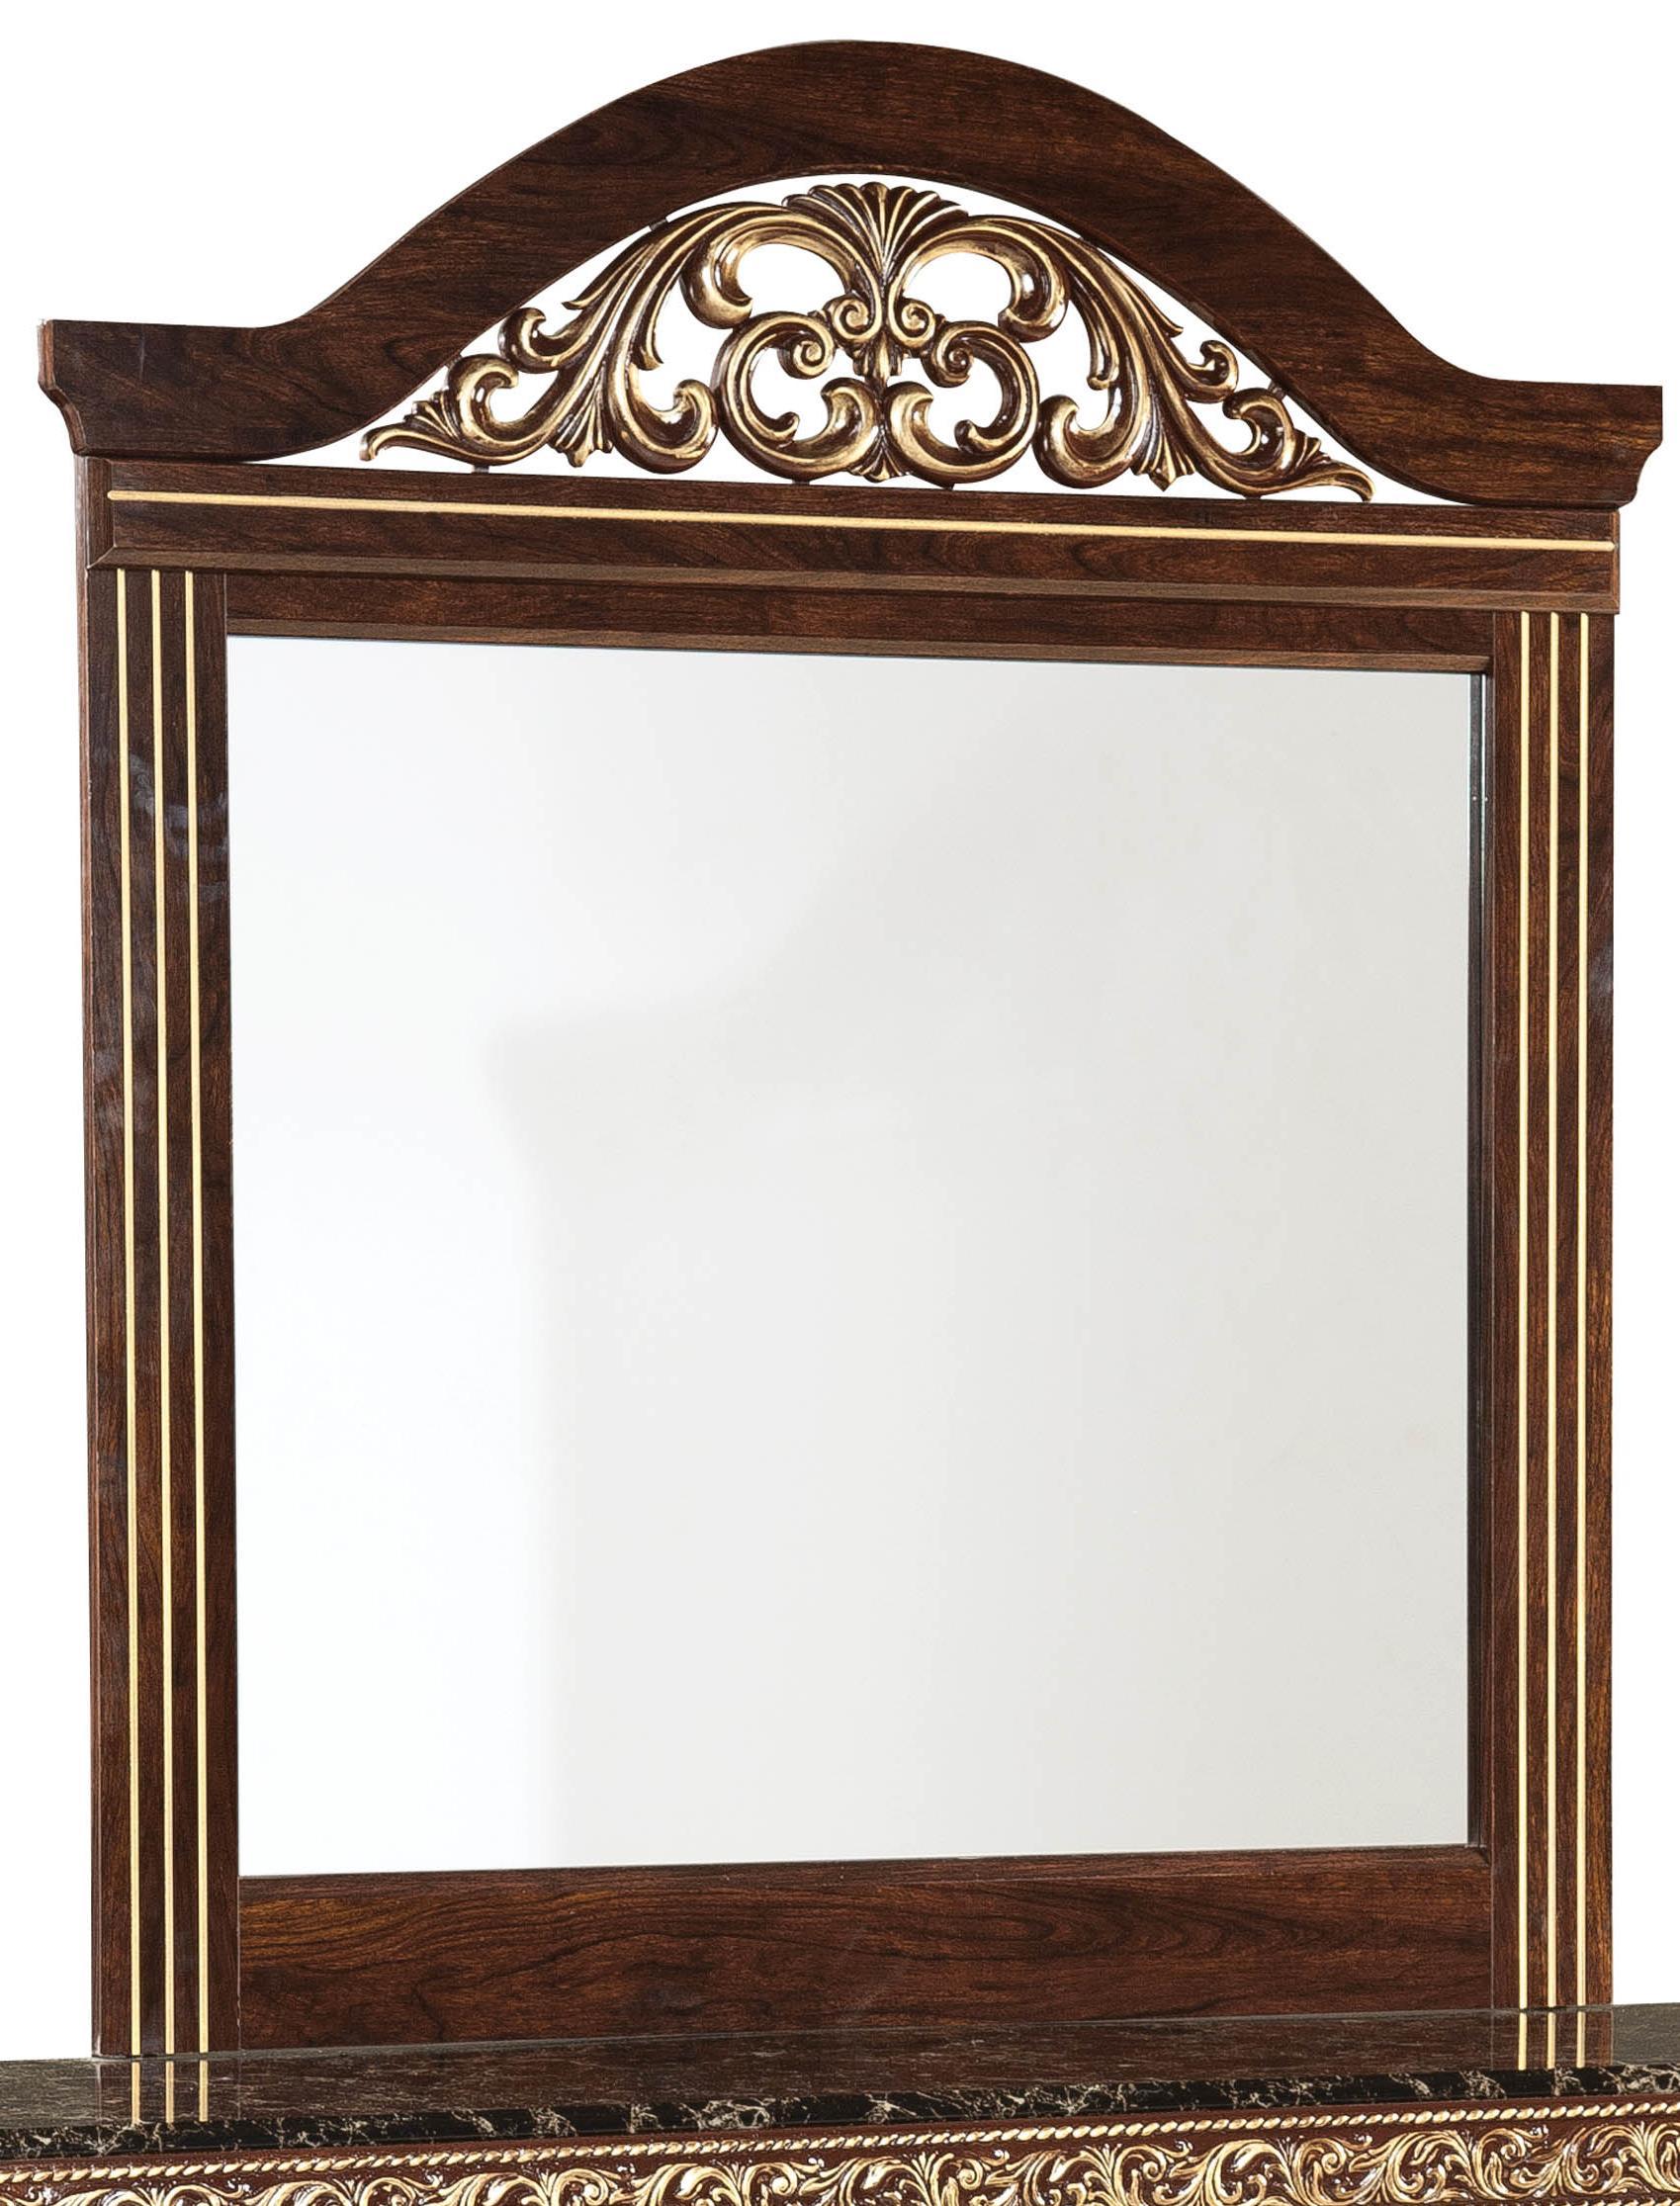 Standard Furniture Odessa Mirror - Item Number: 69518